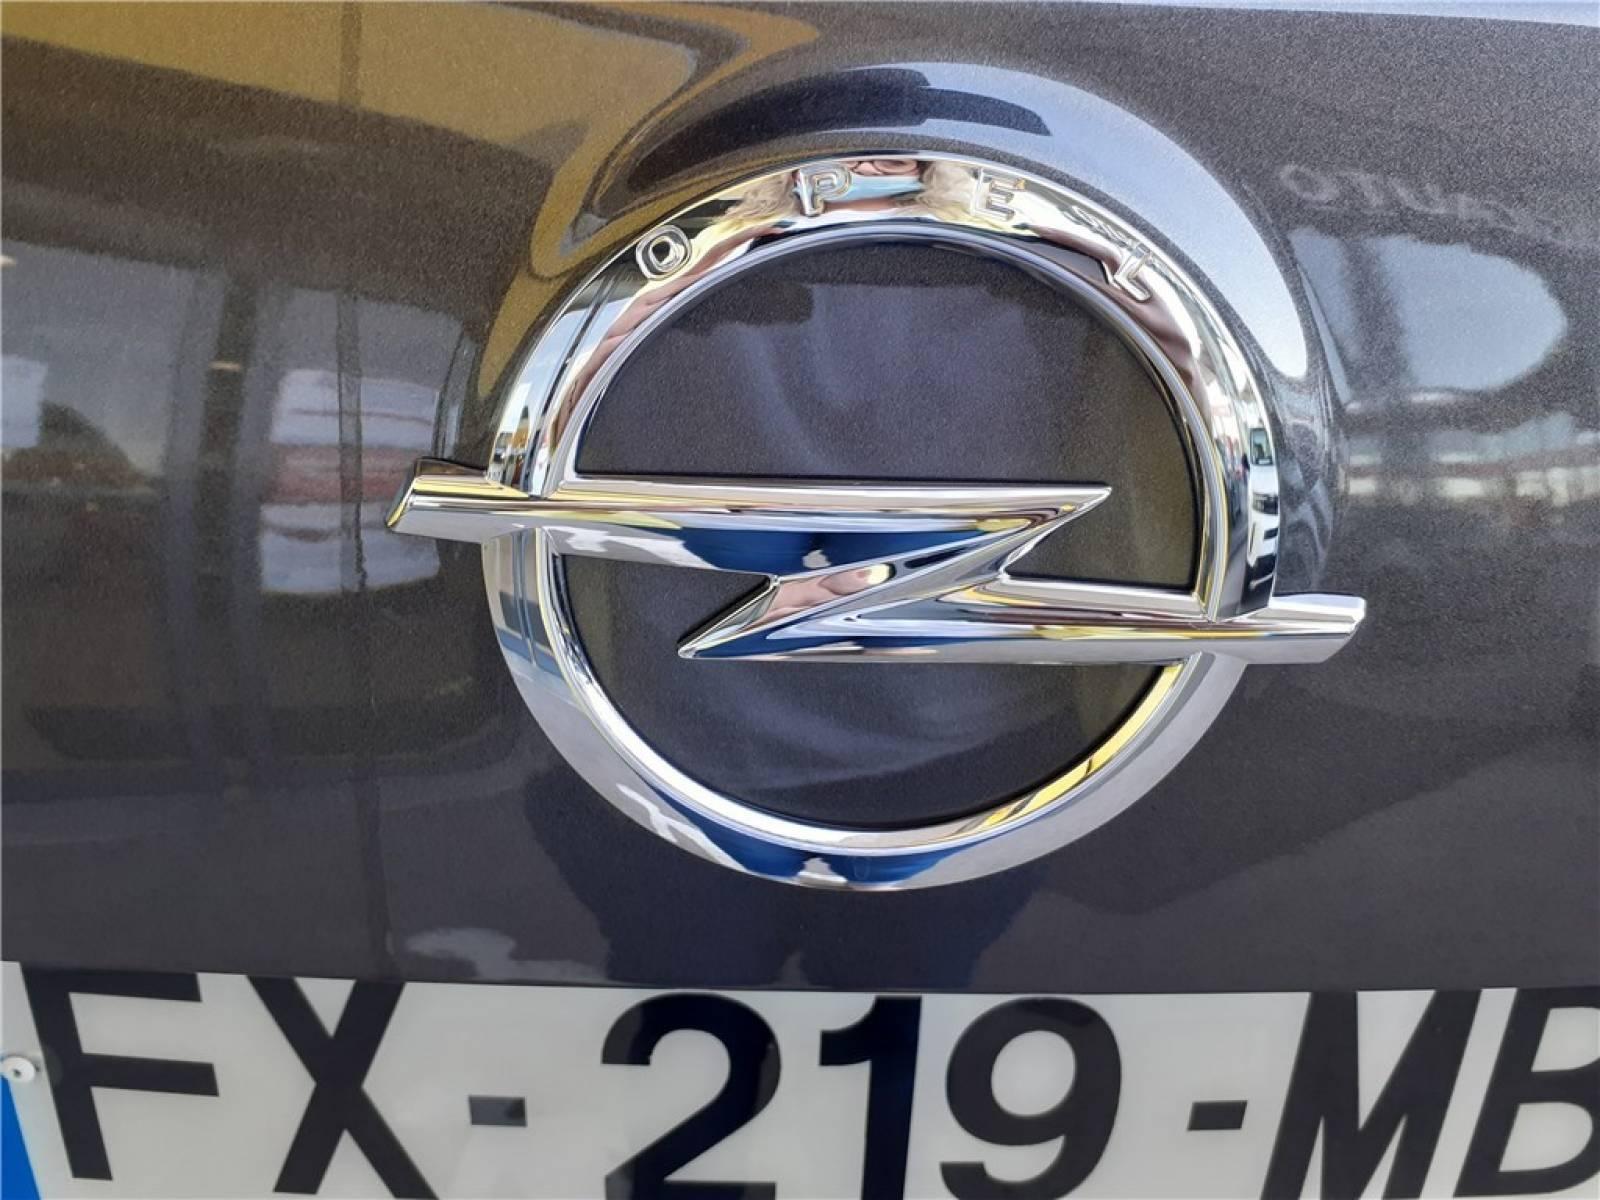 OPEL Crossland X 1.2 Turbo 130 ch - véhicule d'occasion - Groupe Guillet - Opel Magicauto - Chalon-sur-Saône - 71380 - Saint-Marcel - 5